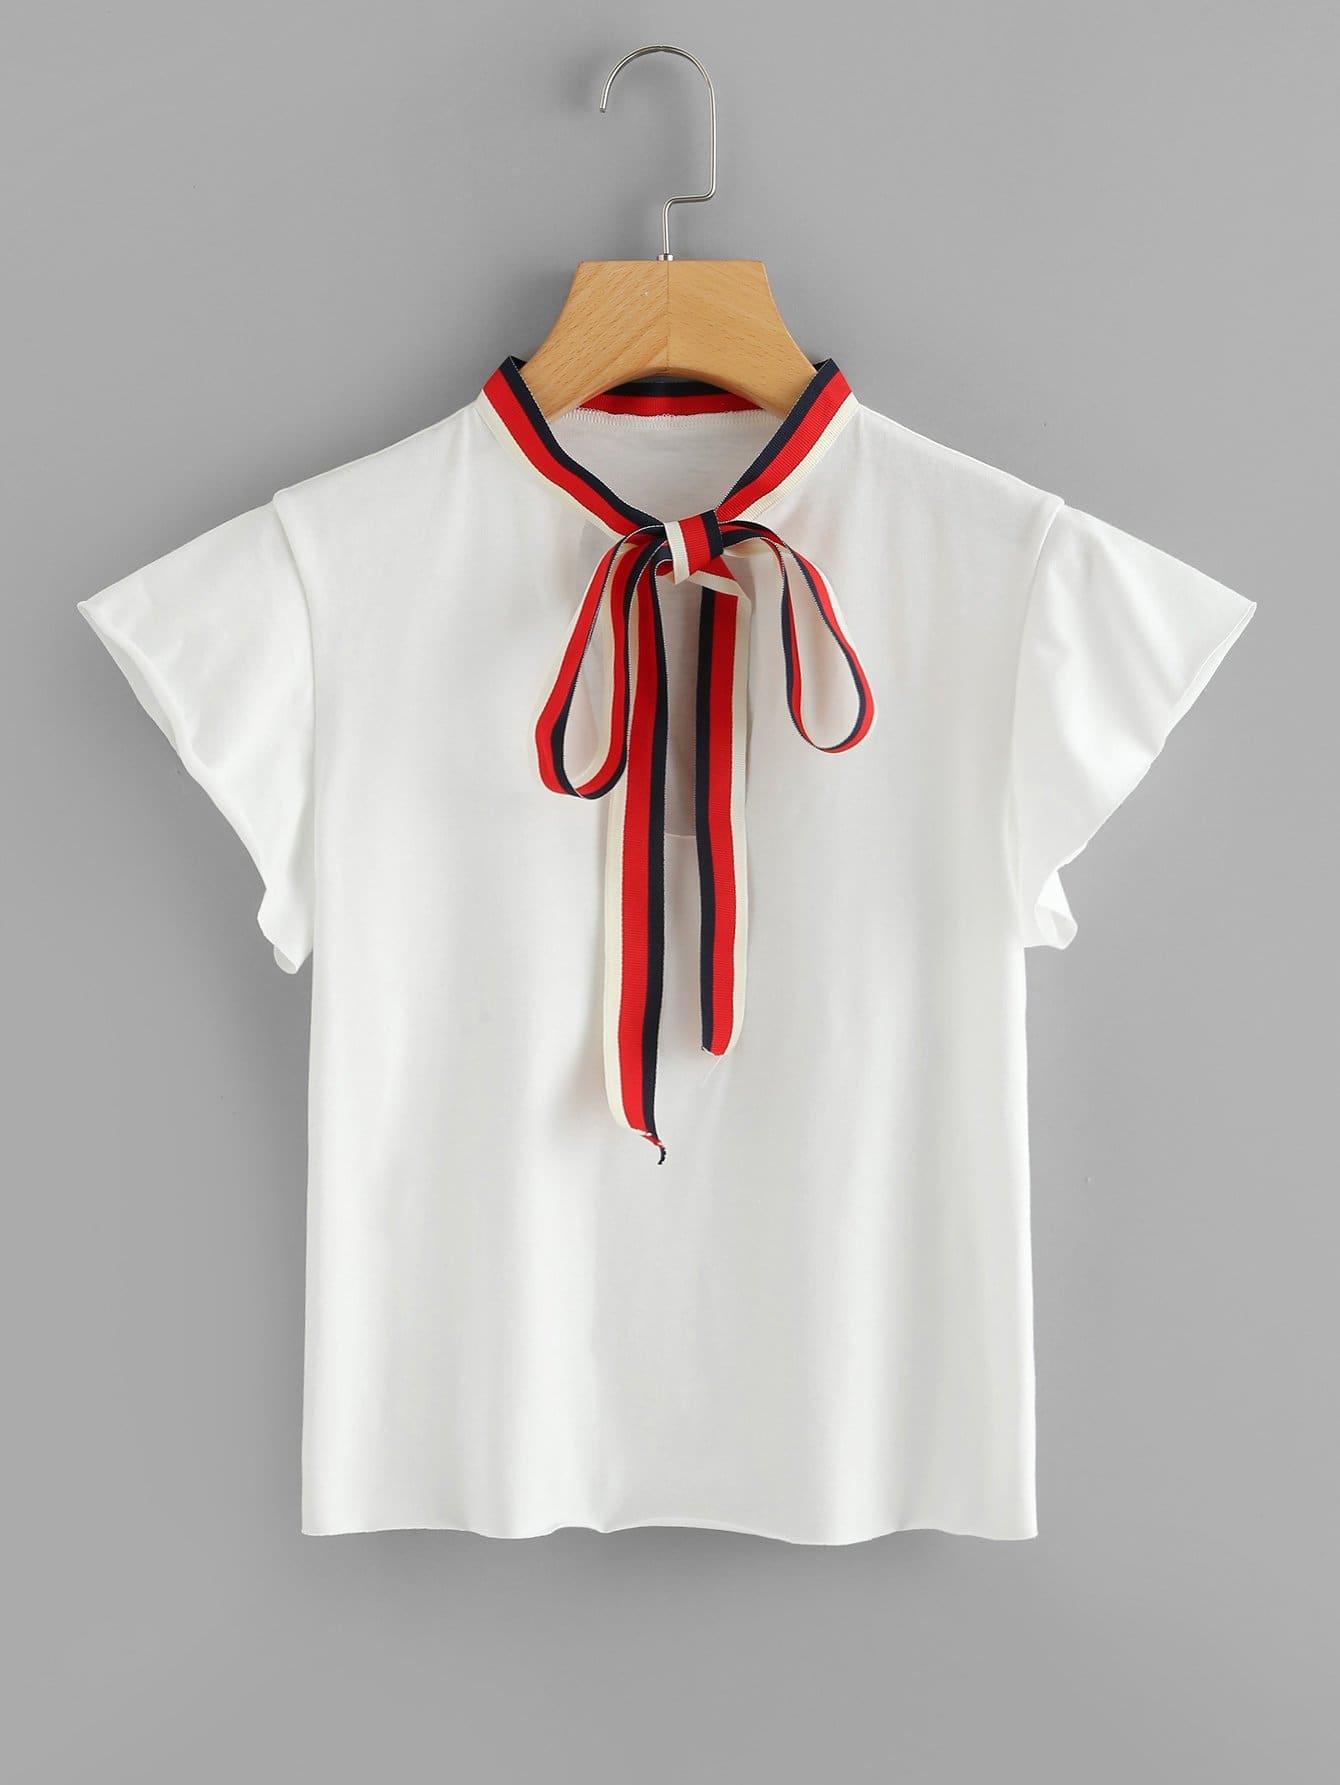 Contrast Striped Tie Neck Tee